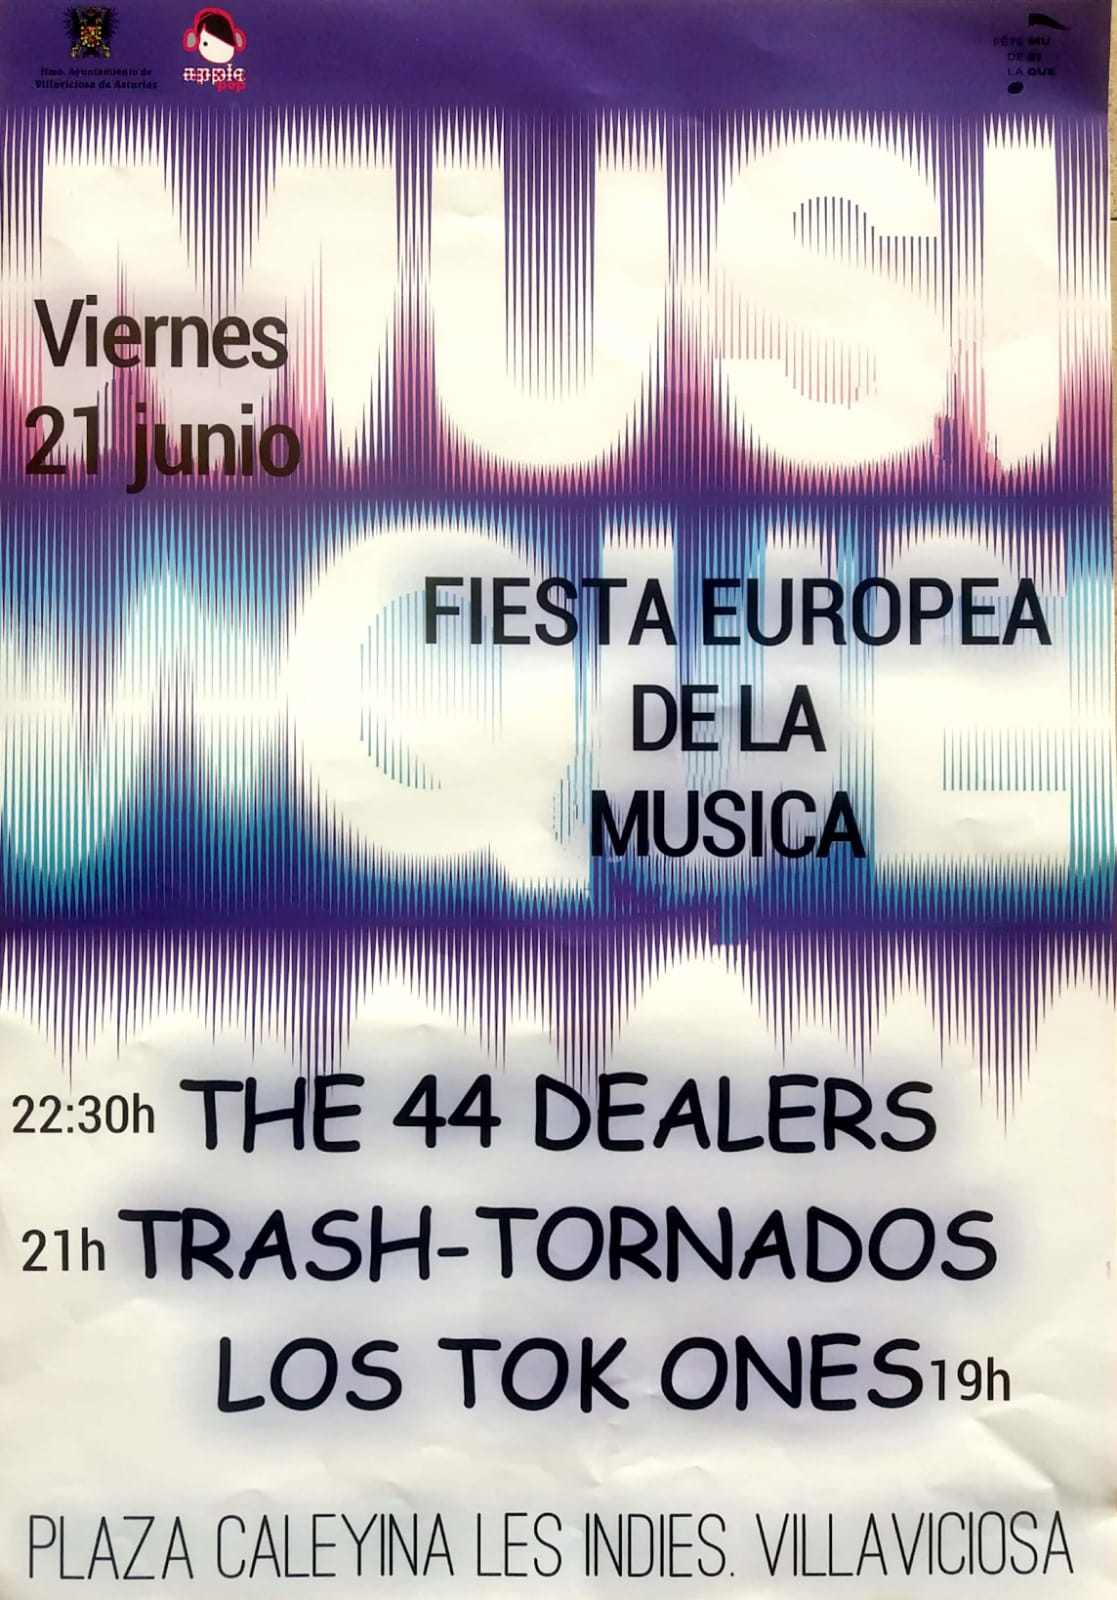 Fiesta Europea de la Música @ Plaza Caleyina les Indies | Villaviciosa | Principado de Asturias | España